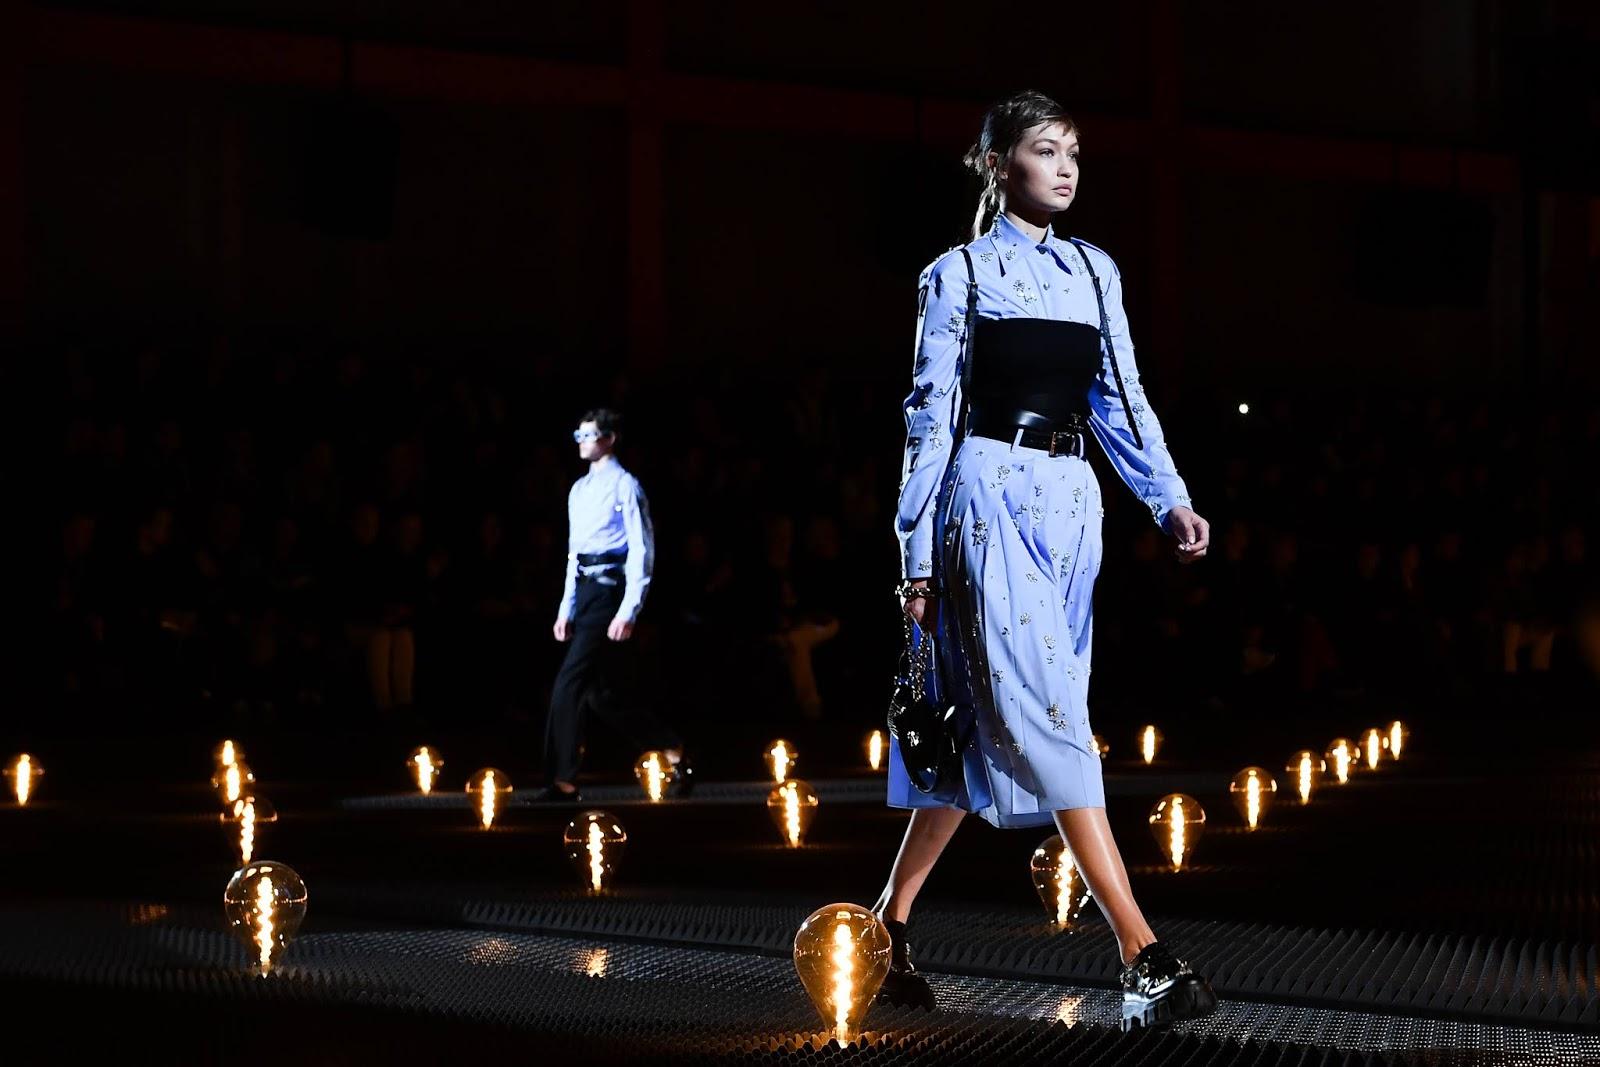 Gigi Hadid - walks the runway at the Prada show during Milan Menswear Fashion Week Autumn/Winter 2019/20 on January 13, 2019 in Milan, Italy